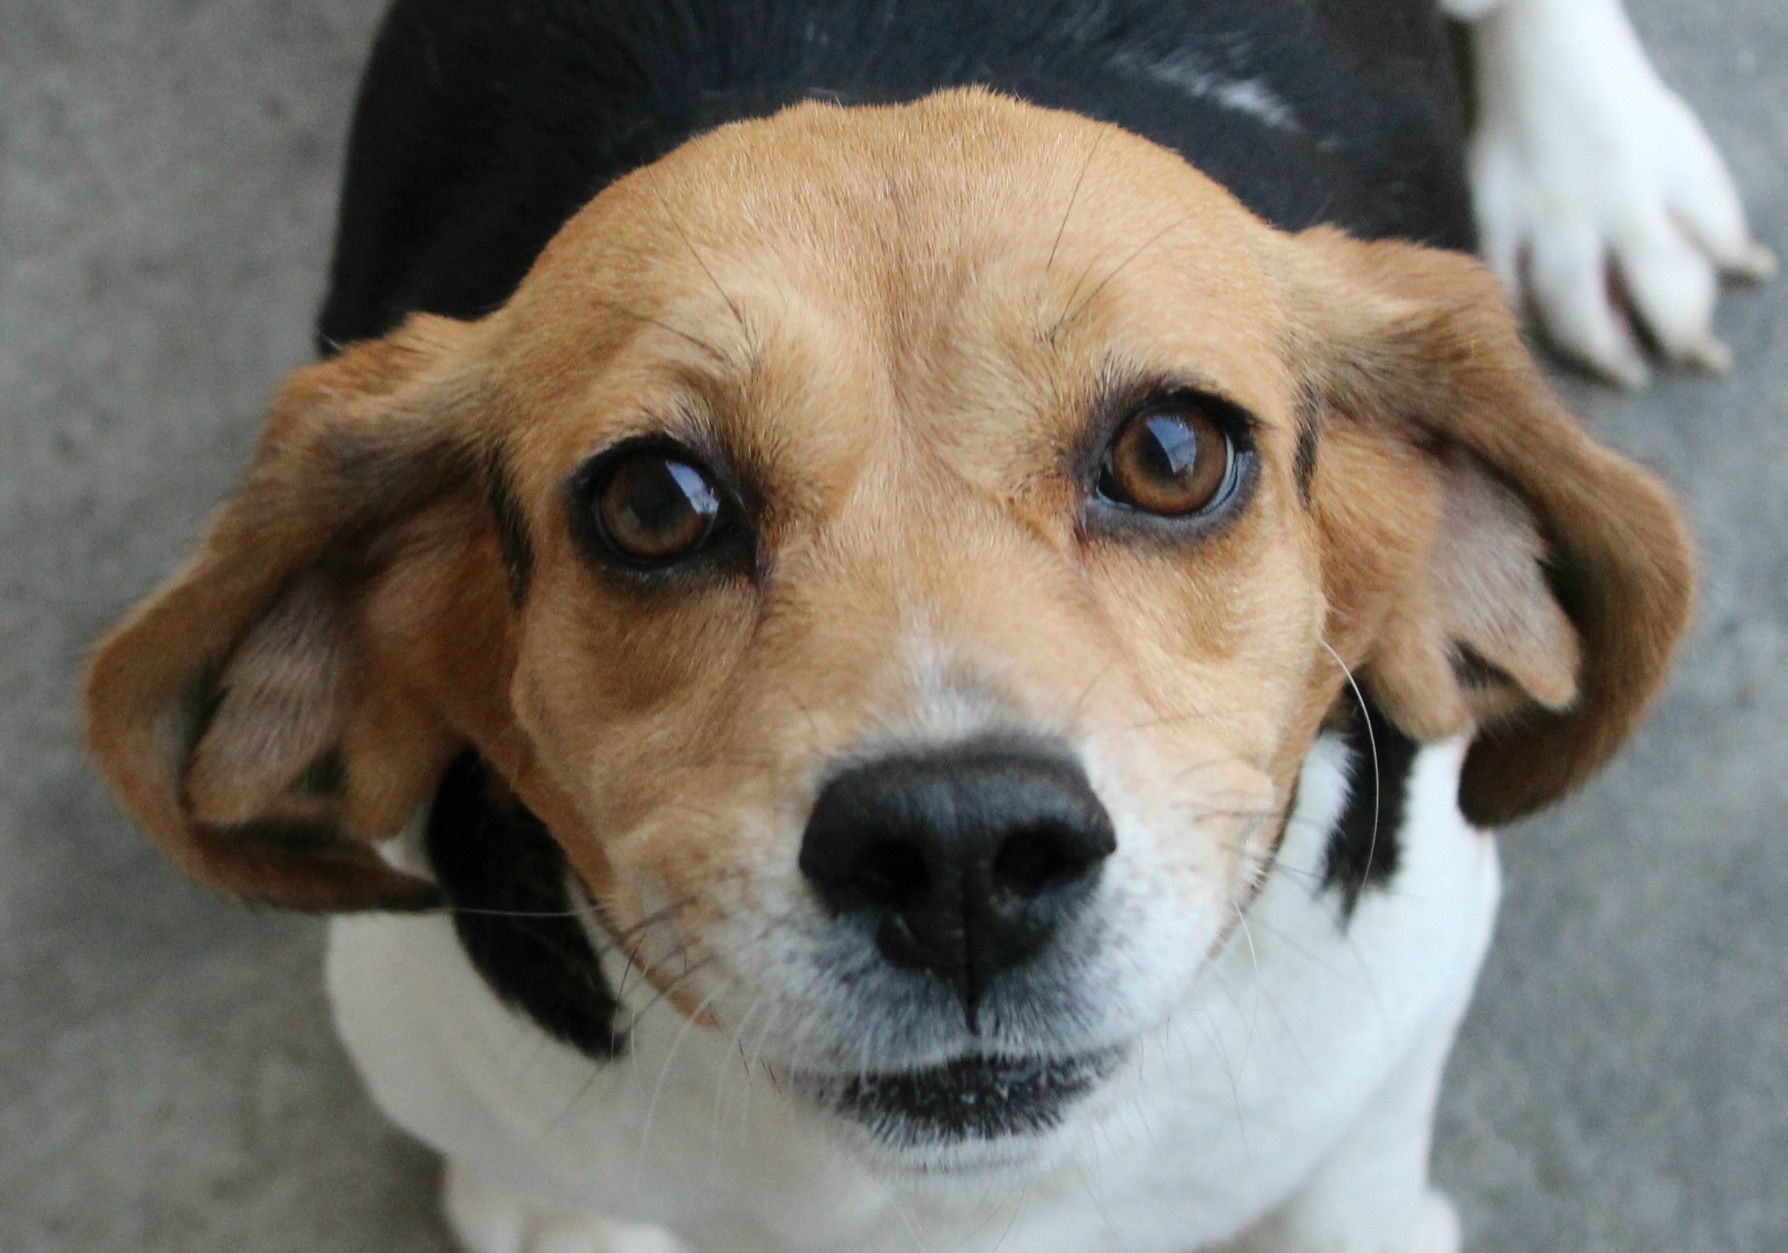 Beagle dog for Adoption in Hilton Head, SC. ADN511105 on